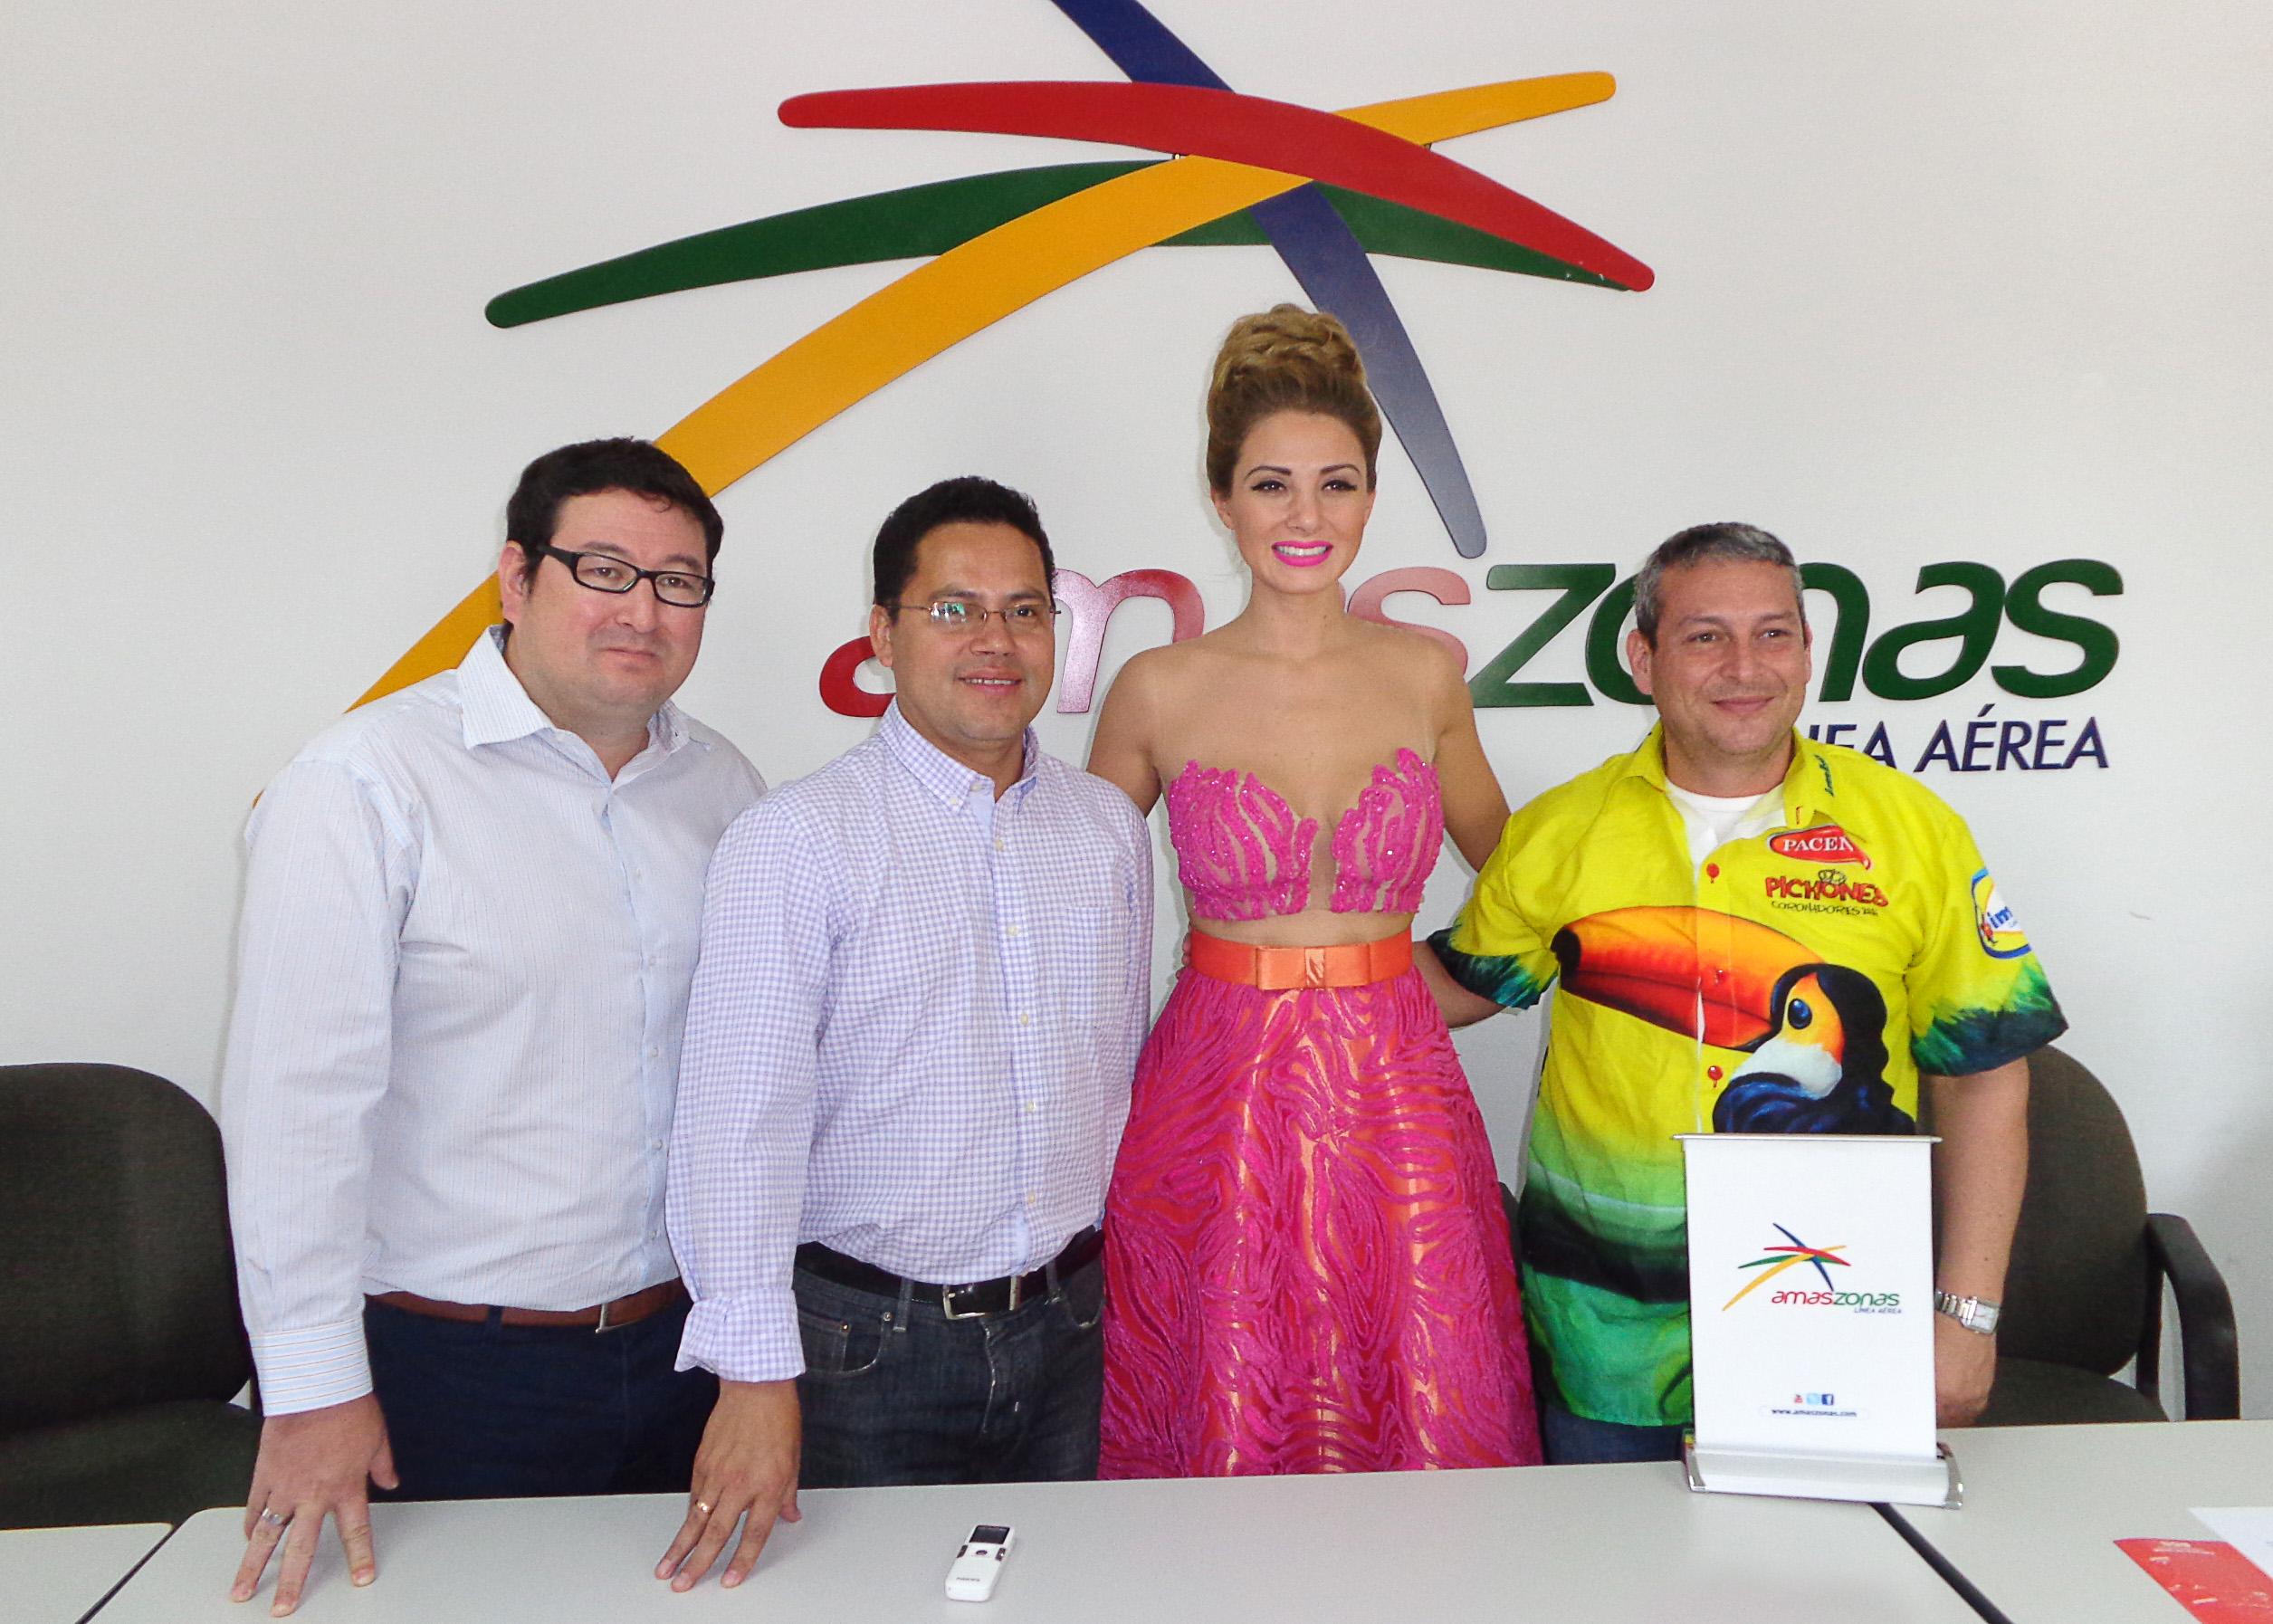 Alan Botello, Eddy Luis Franco, Valeria Saucedo y Eduardo Antelo.